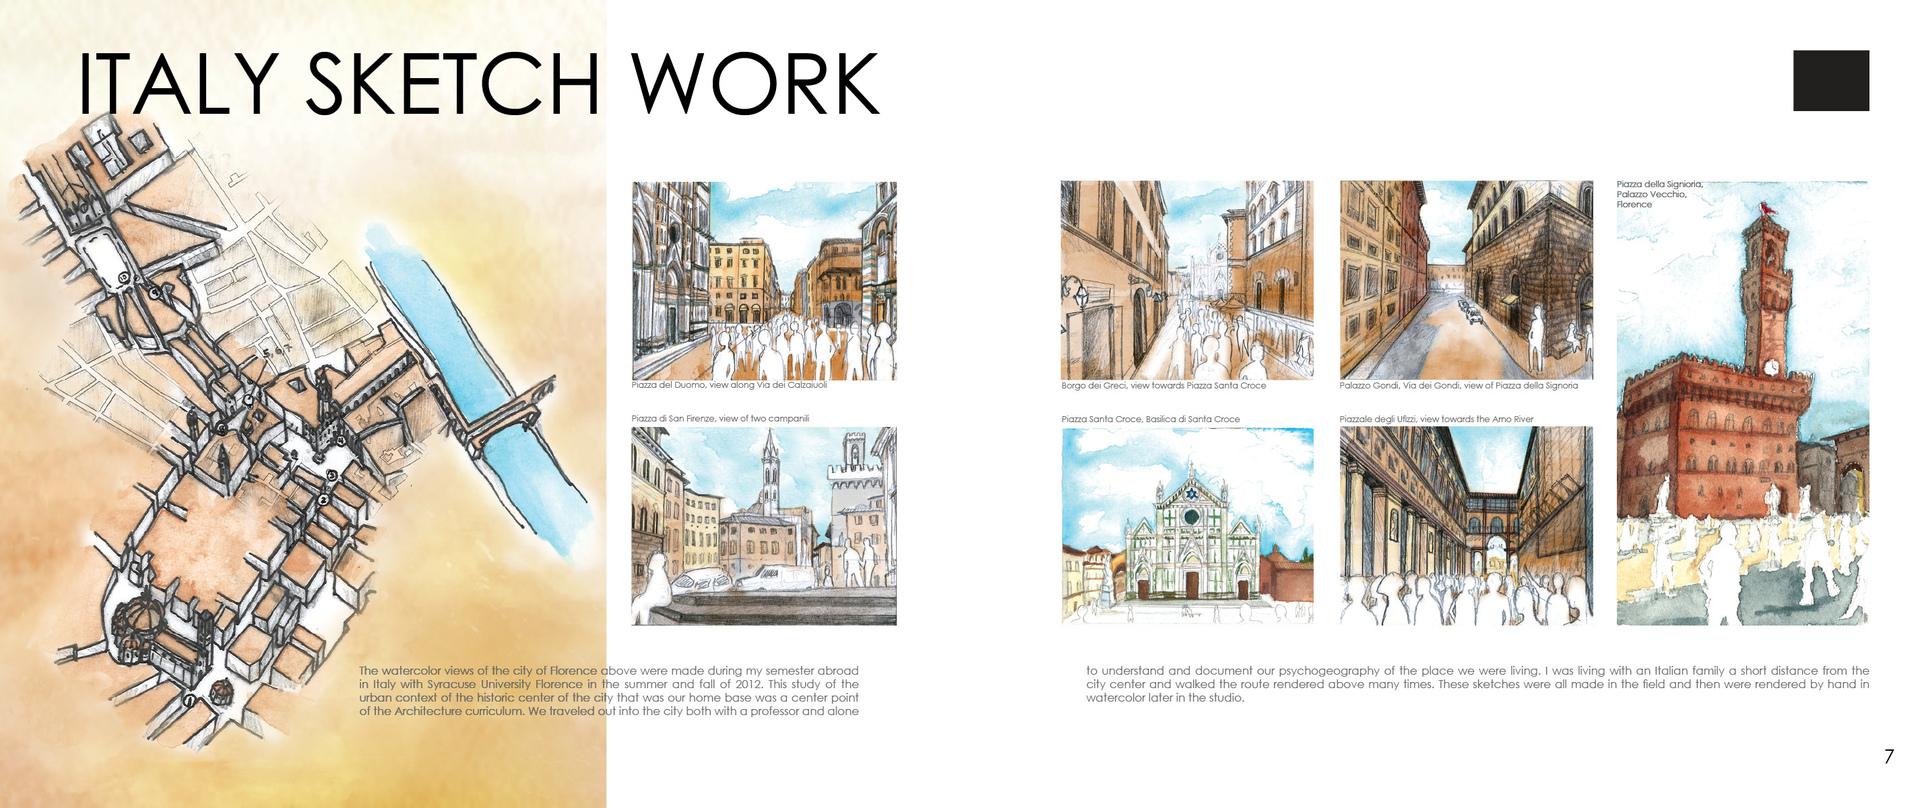 Dorable Home Base Abroad Elaboration - Home Decorating Inspiration ...